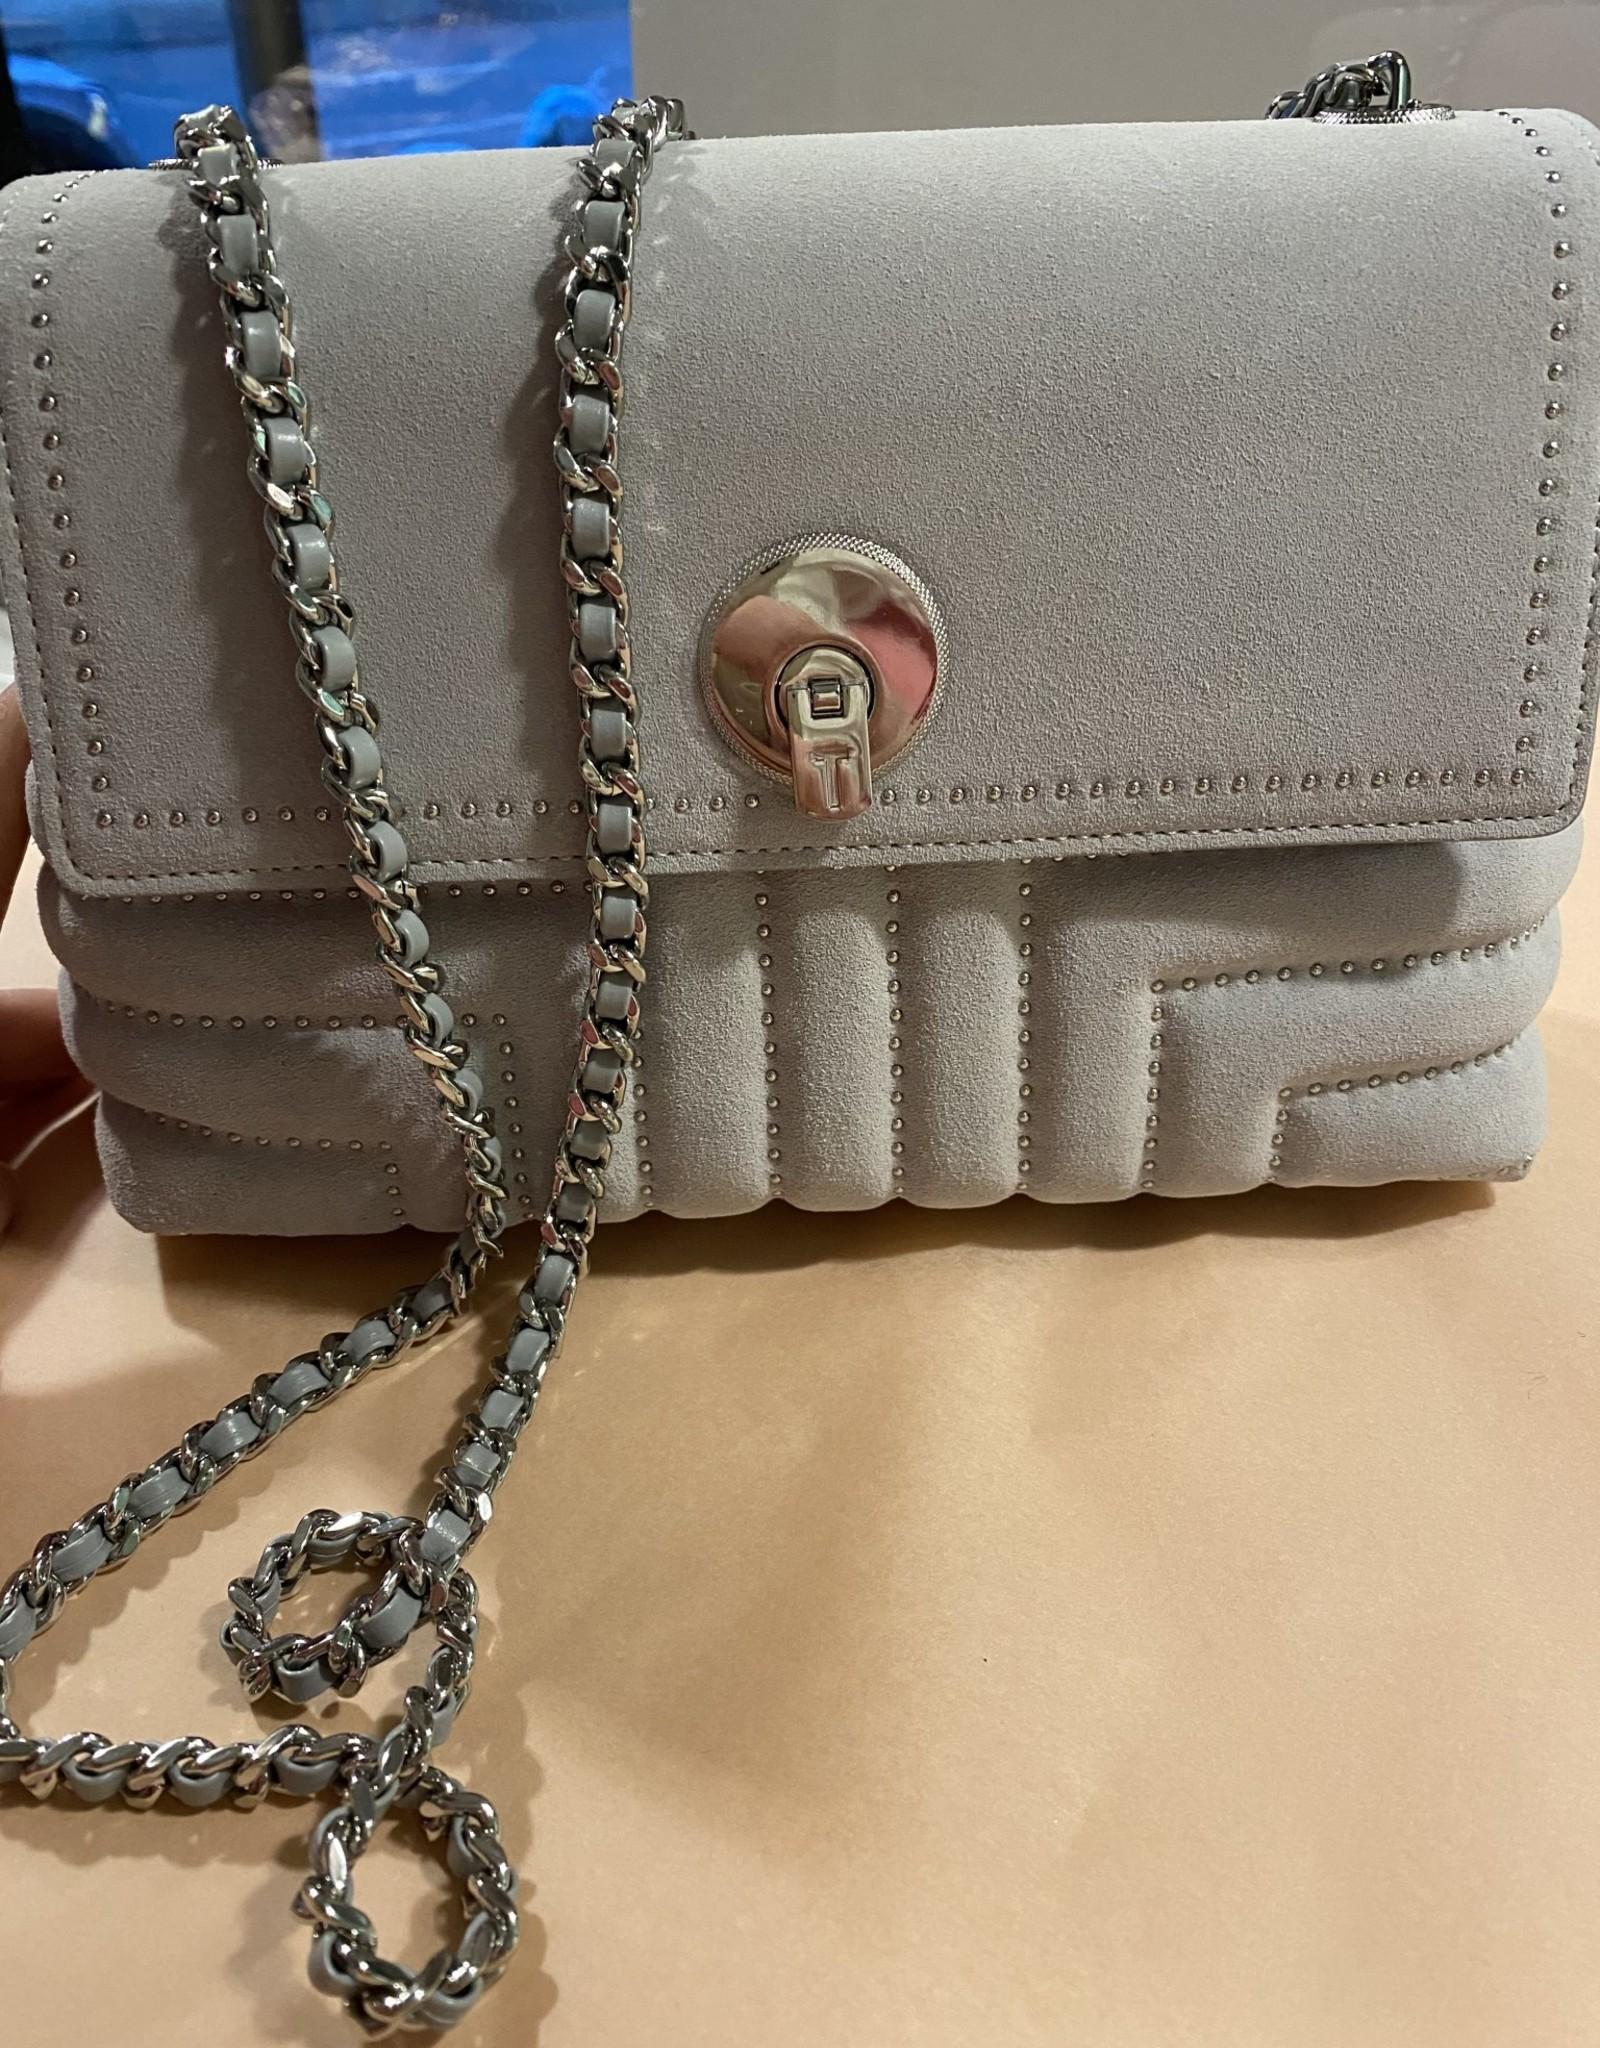 Ted Baker SADDIIE studded circle lock xbody bag - light grey